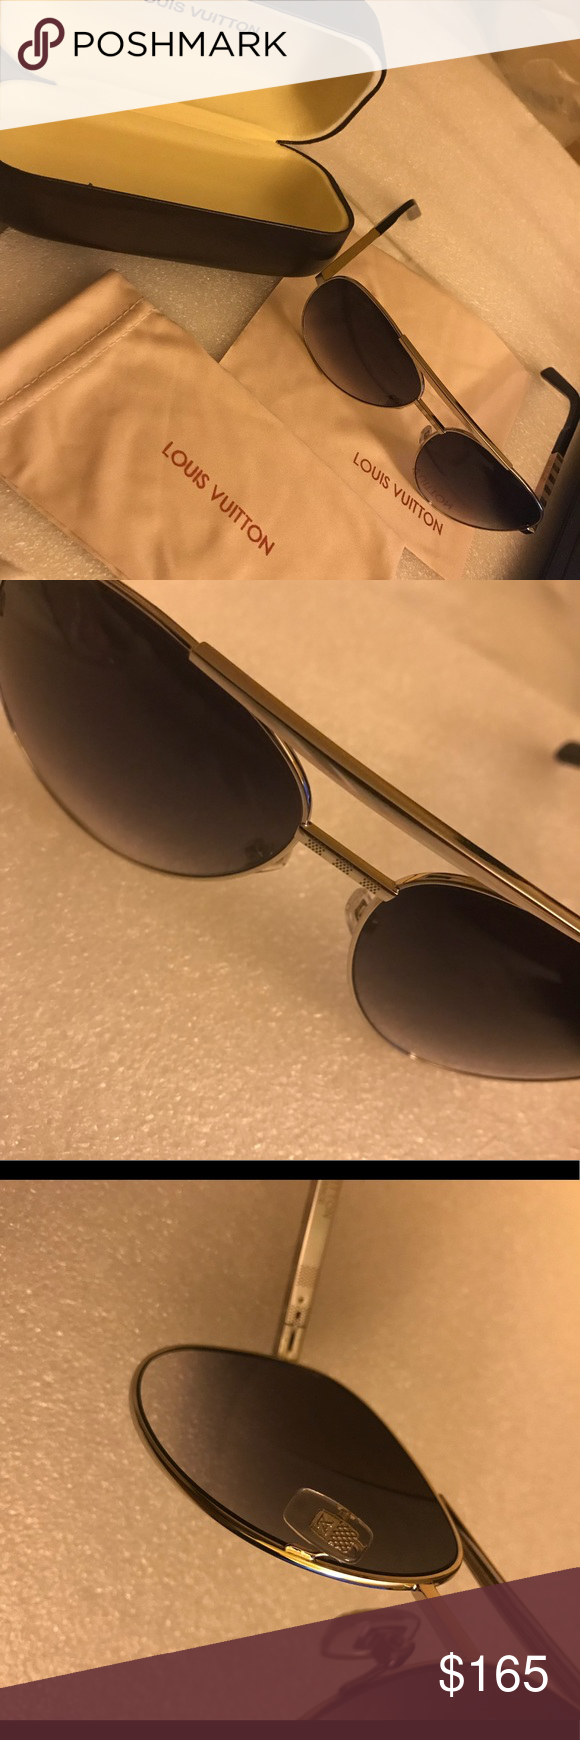 f32198e94747 Authentic LV Sunglasses Authentic Louis Vuitton Attitude Pilote model  Z0340U Sunglasses Louis Vuitton Accessories Sunglasses